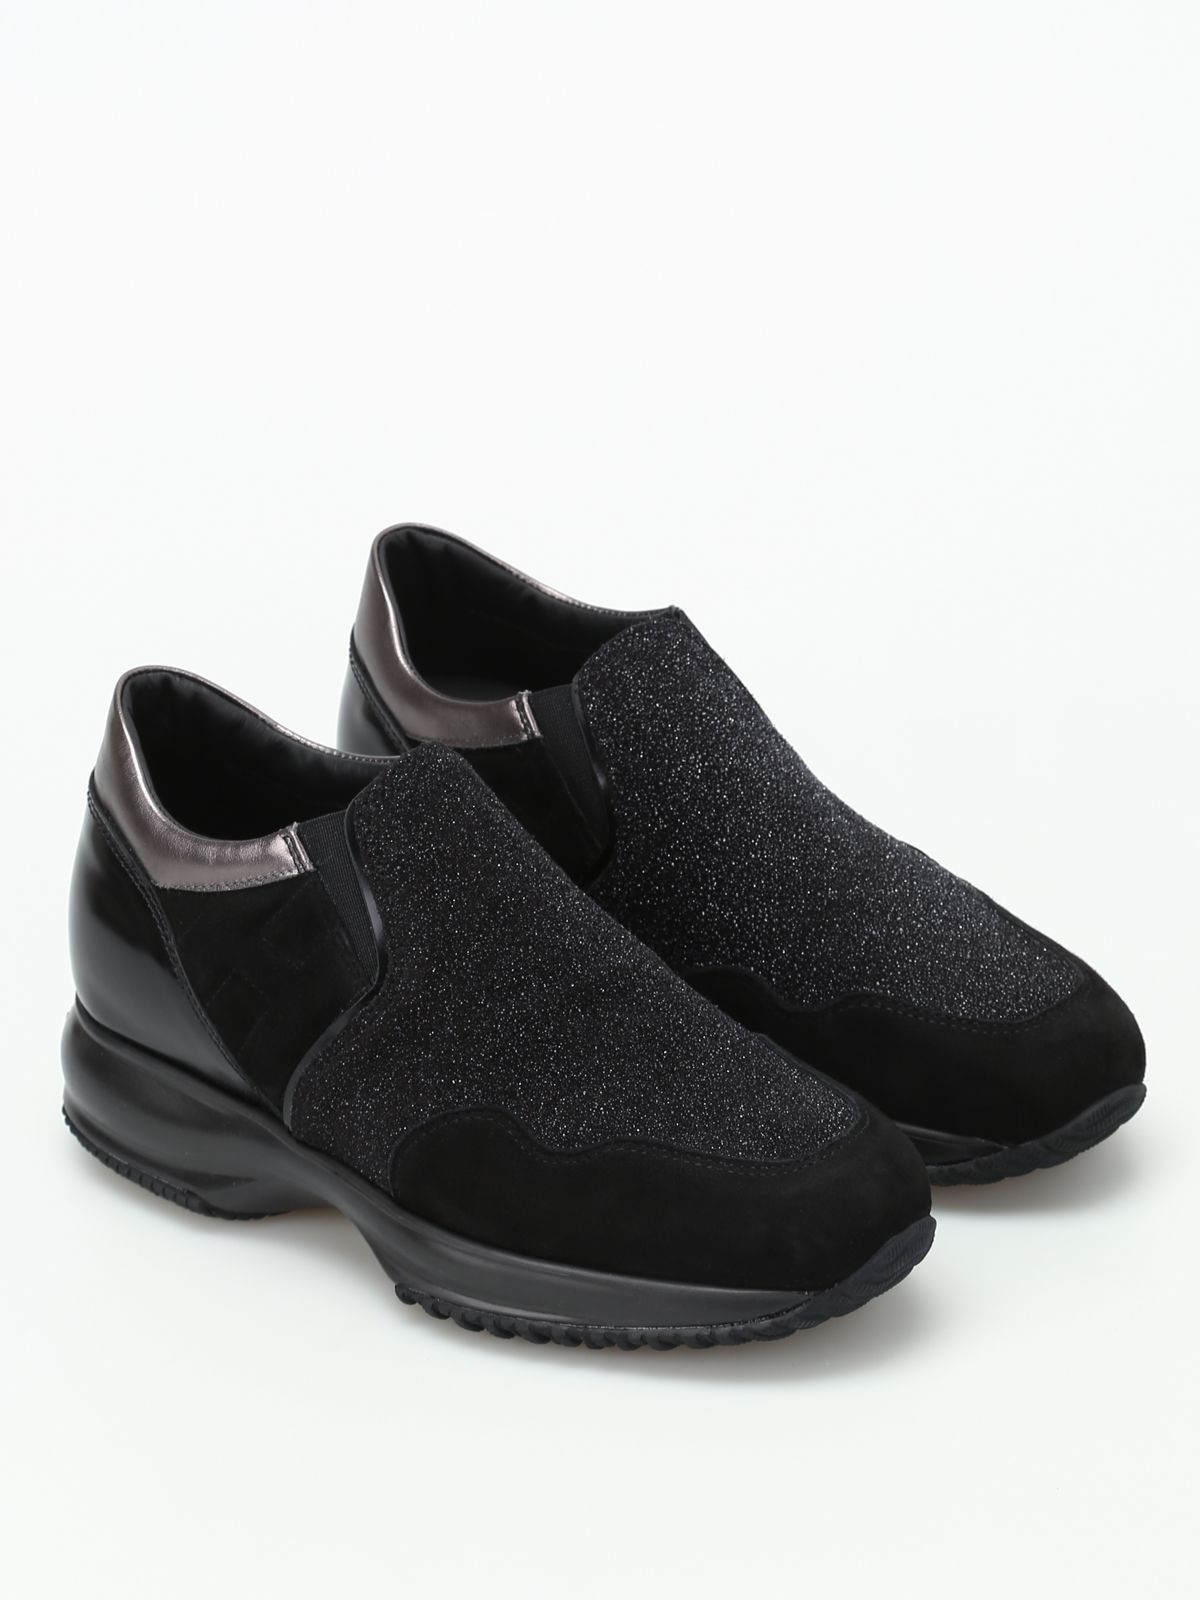 Discount Brand New Unisex Cheap Sale Huge Surprise Hogan Interactive Slip-on Sneakers Clearance Sale Online jc90Pg9